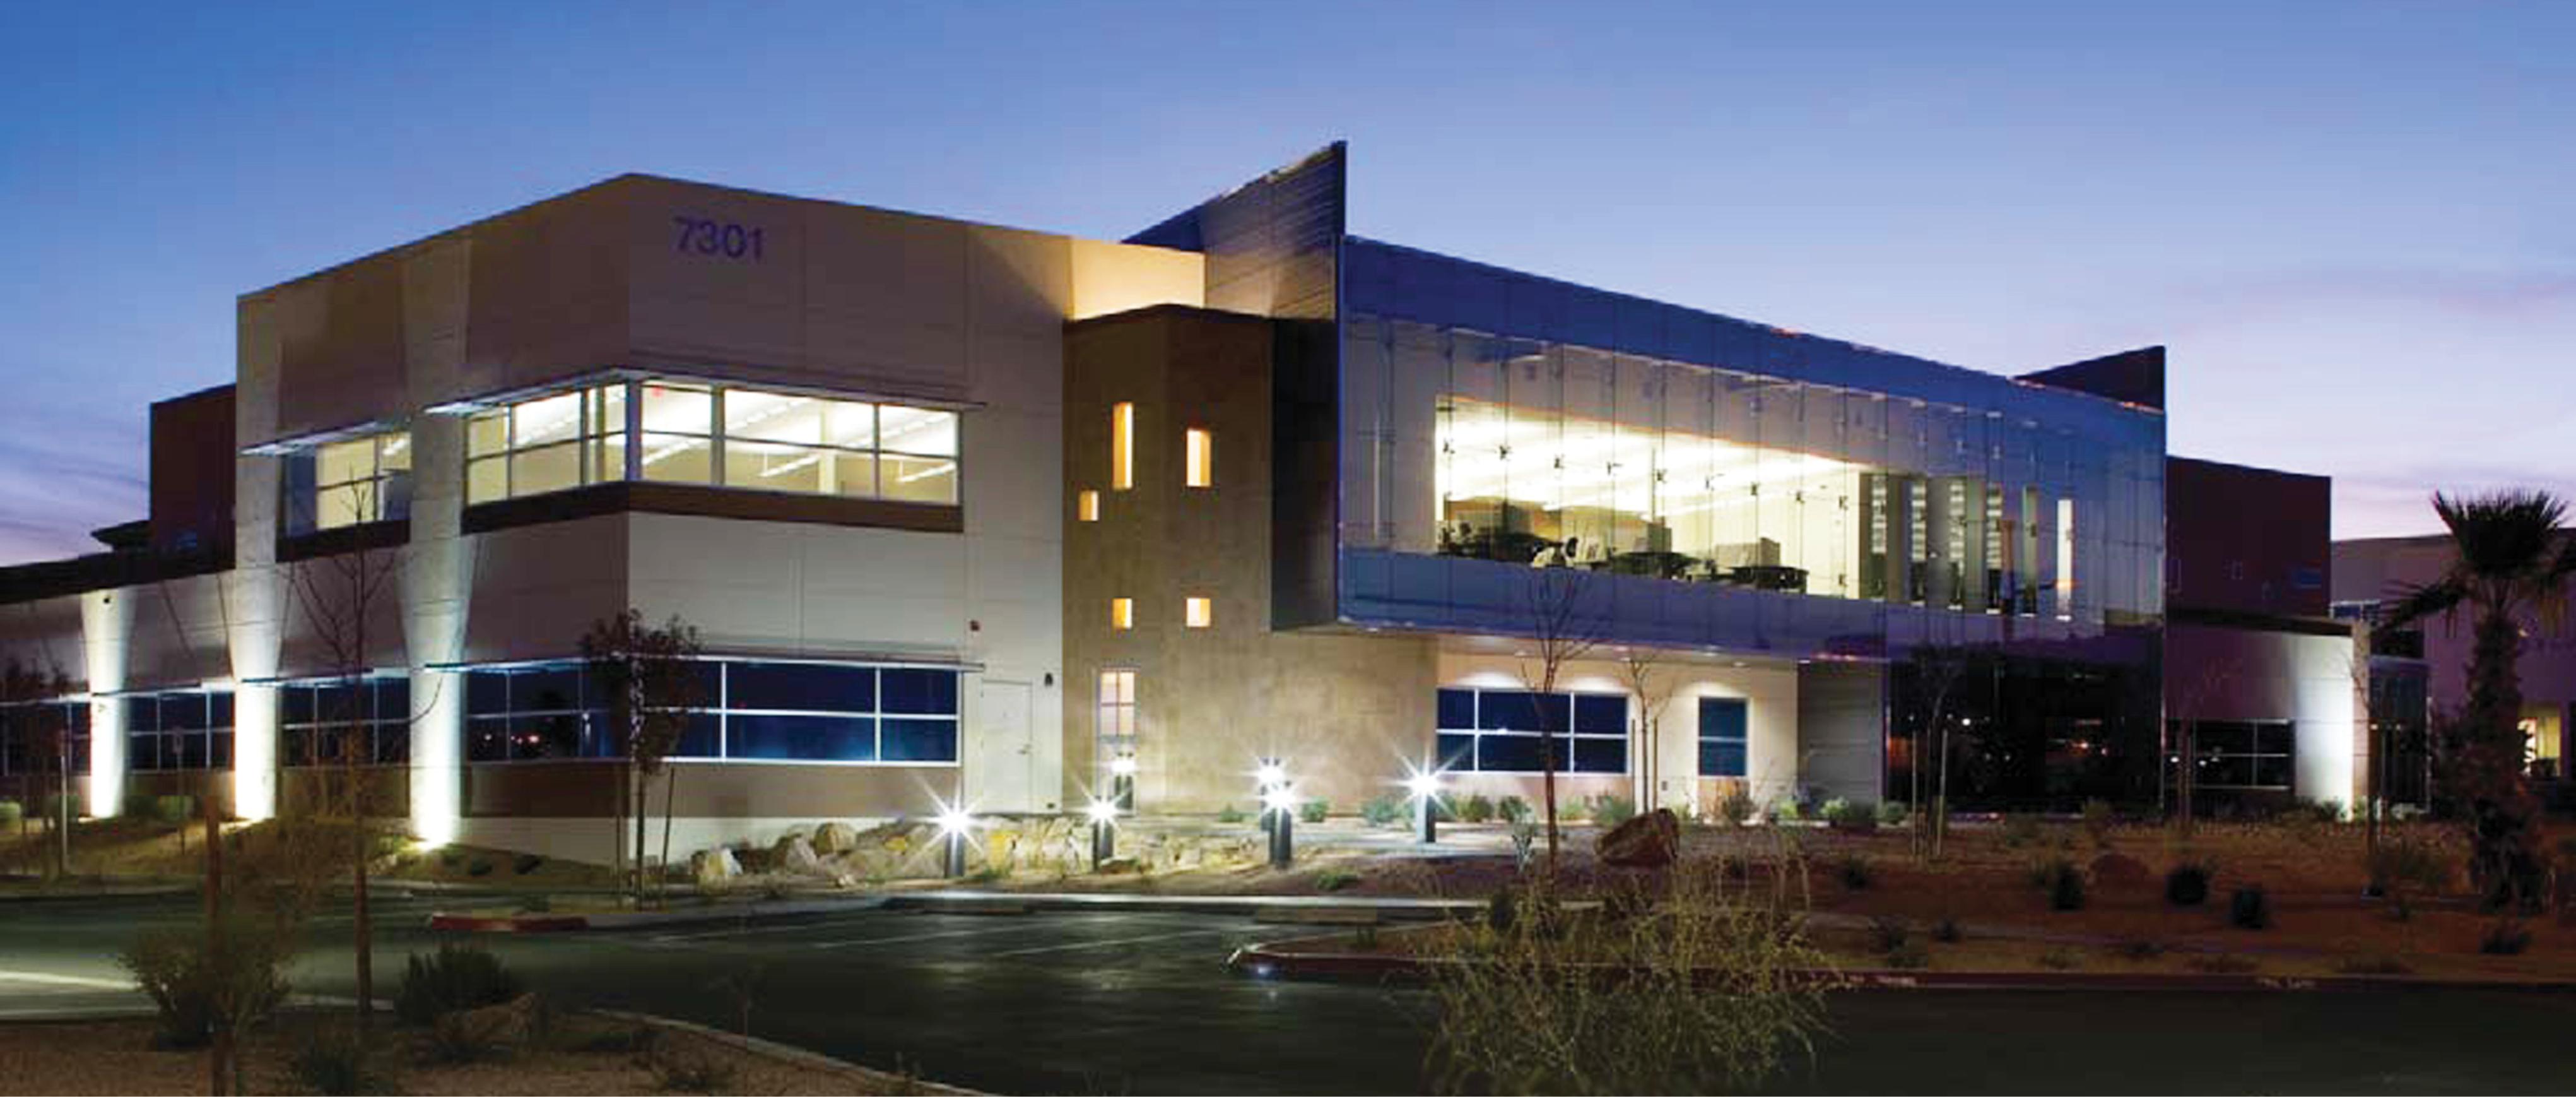 Peak Drive Medical Office Building